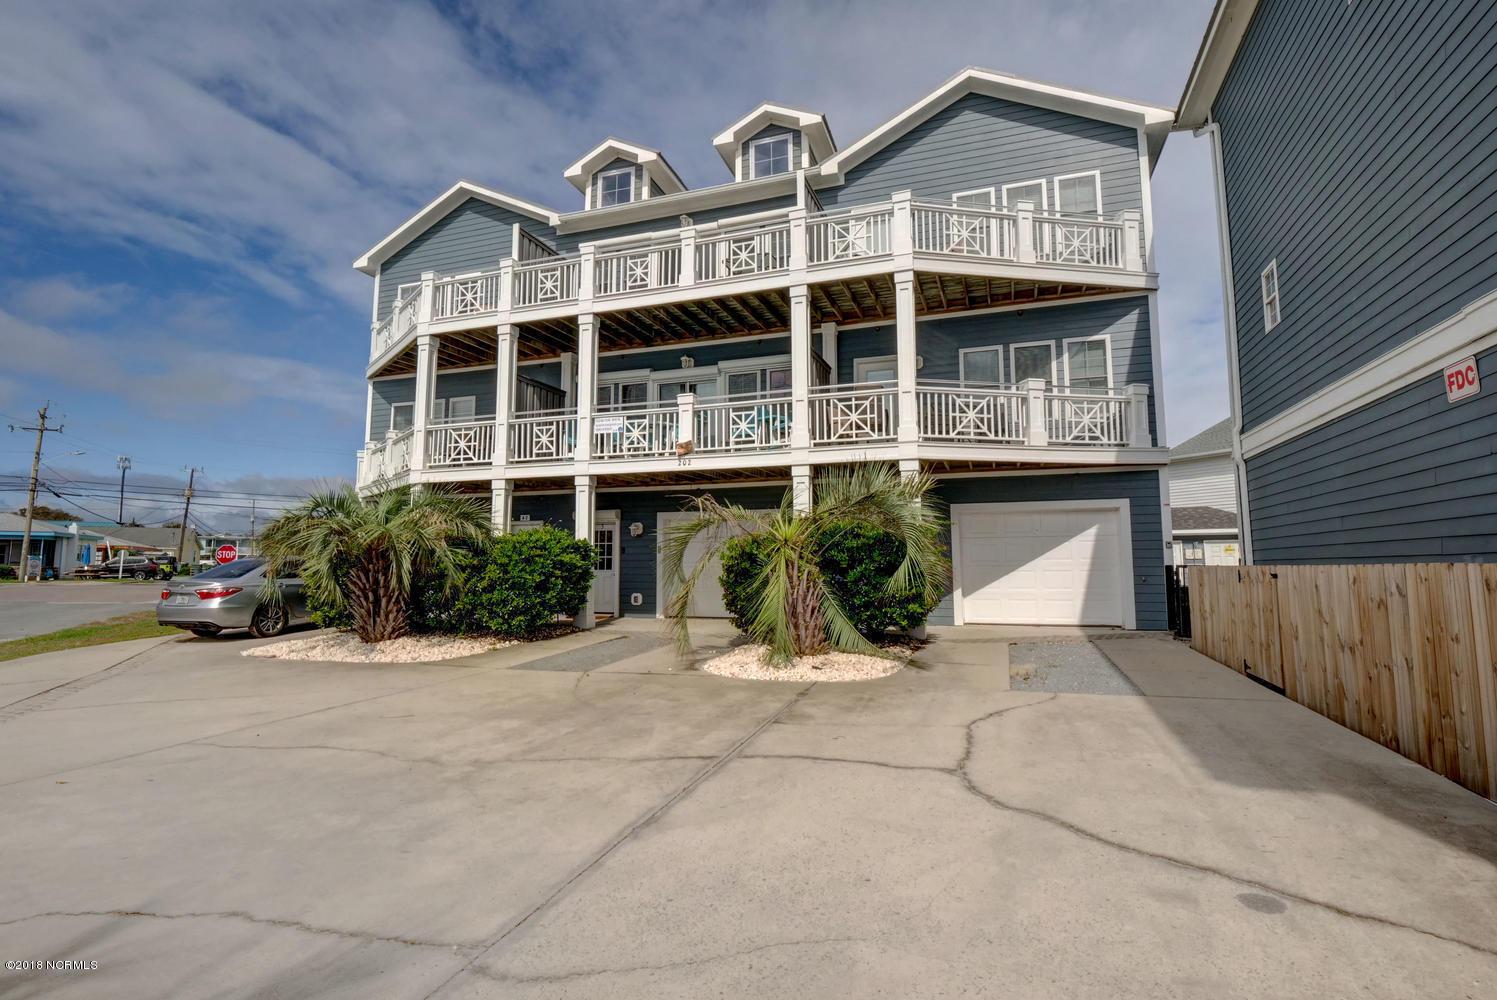 202 Fort Fisher Boulevard, Kure Beach, North Carolina, 4 Bedrooms Bedrooms, 7 Rooms Rooms,3 BathroomsBathrooms,Condominium,For sale,Fort Fisher,100134207